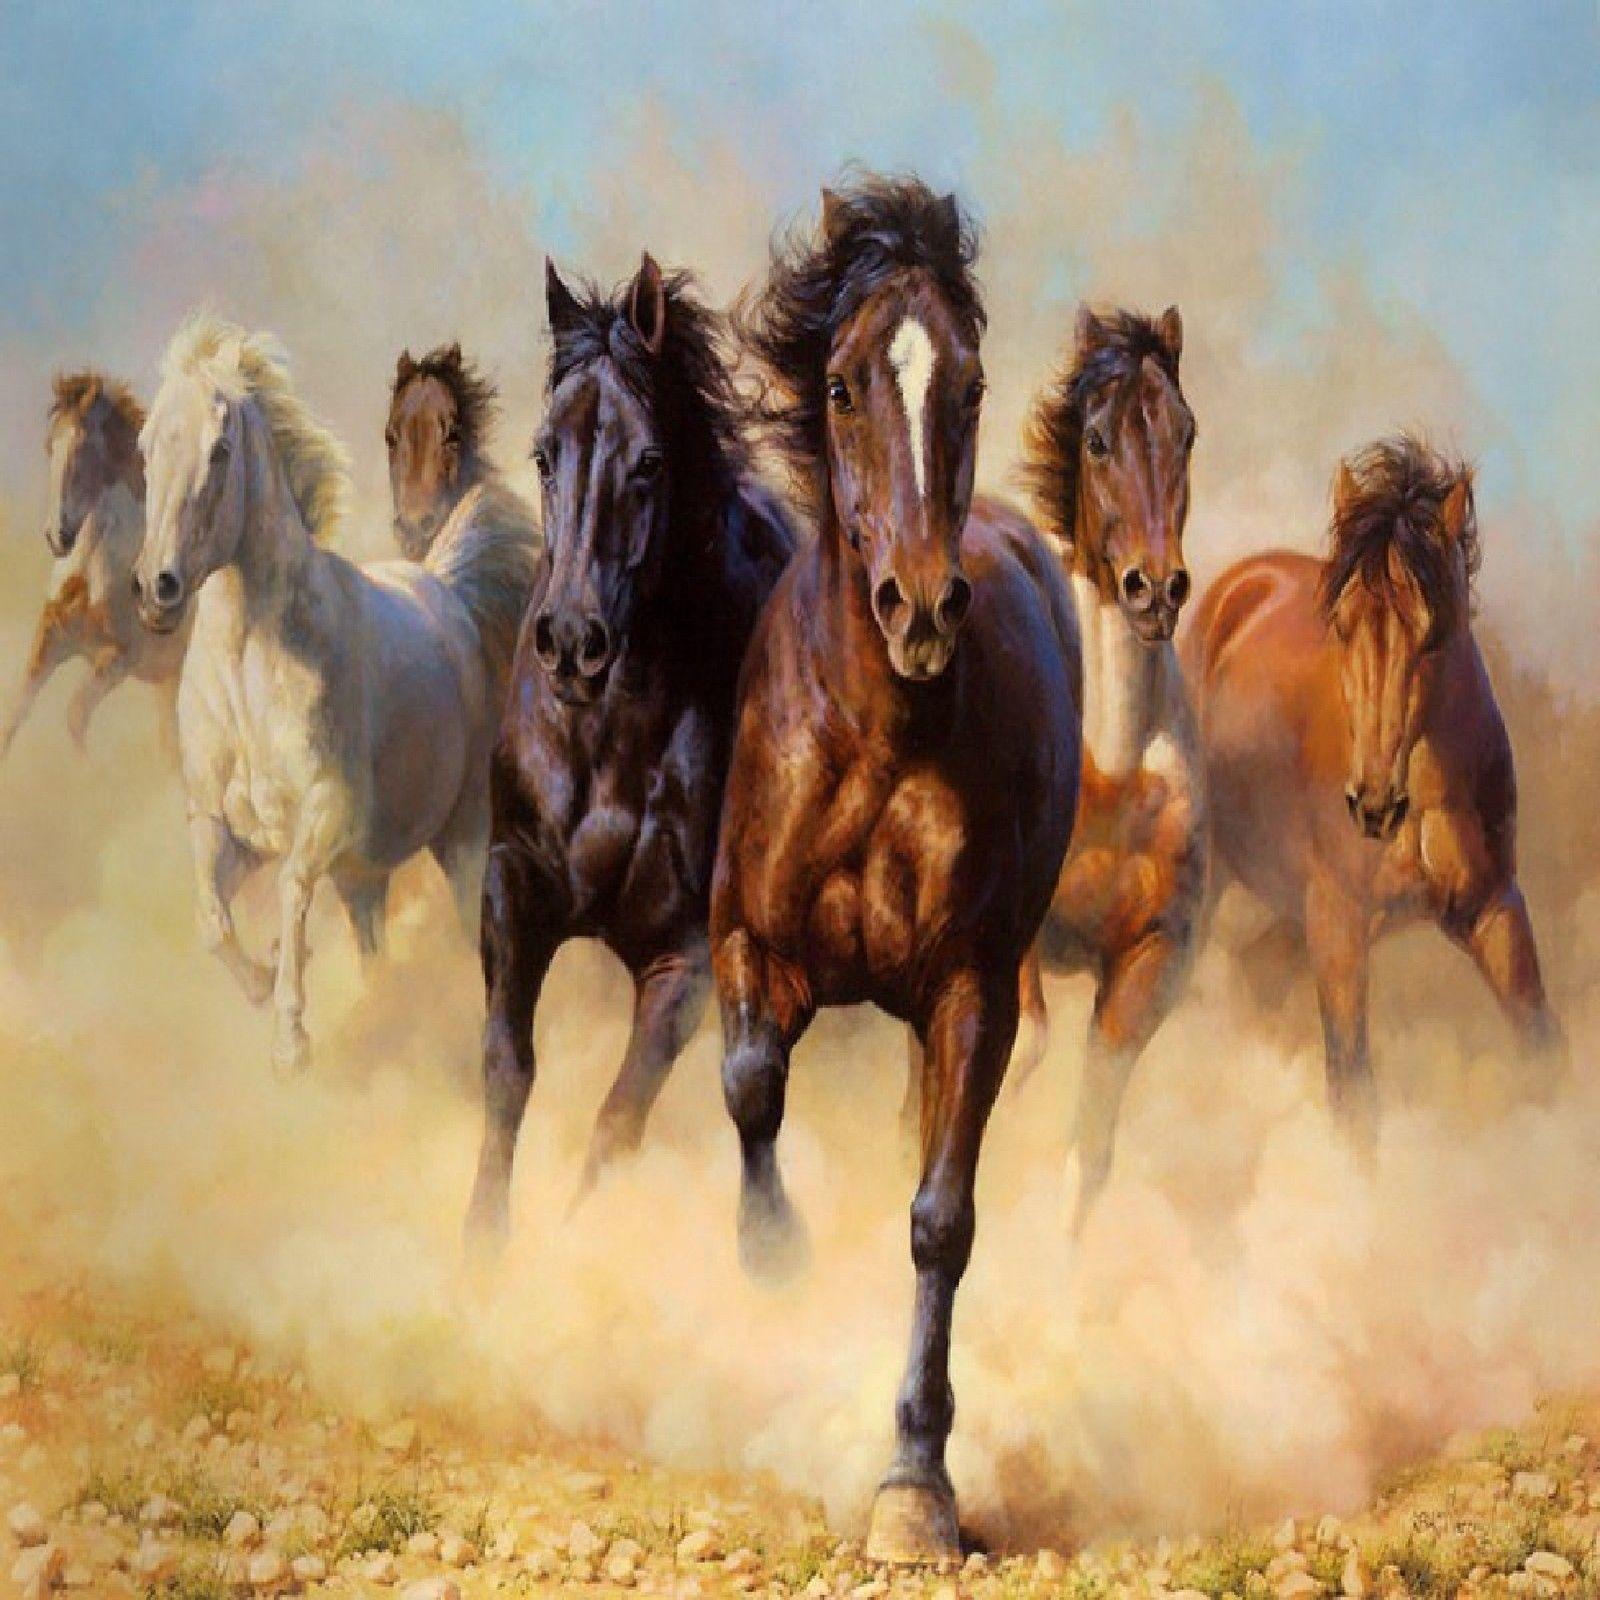 Wild Horses Running Free Coasters Set Of 4 Rubber Backed